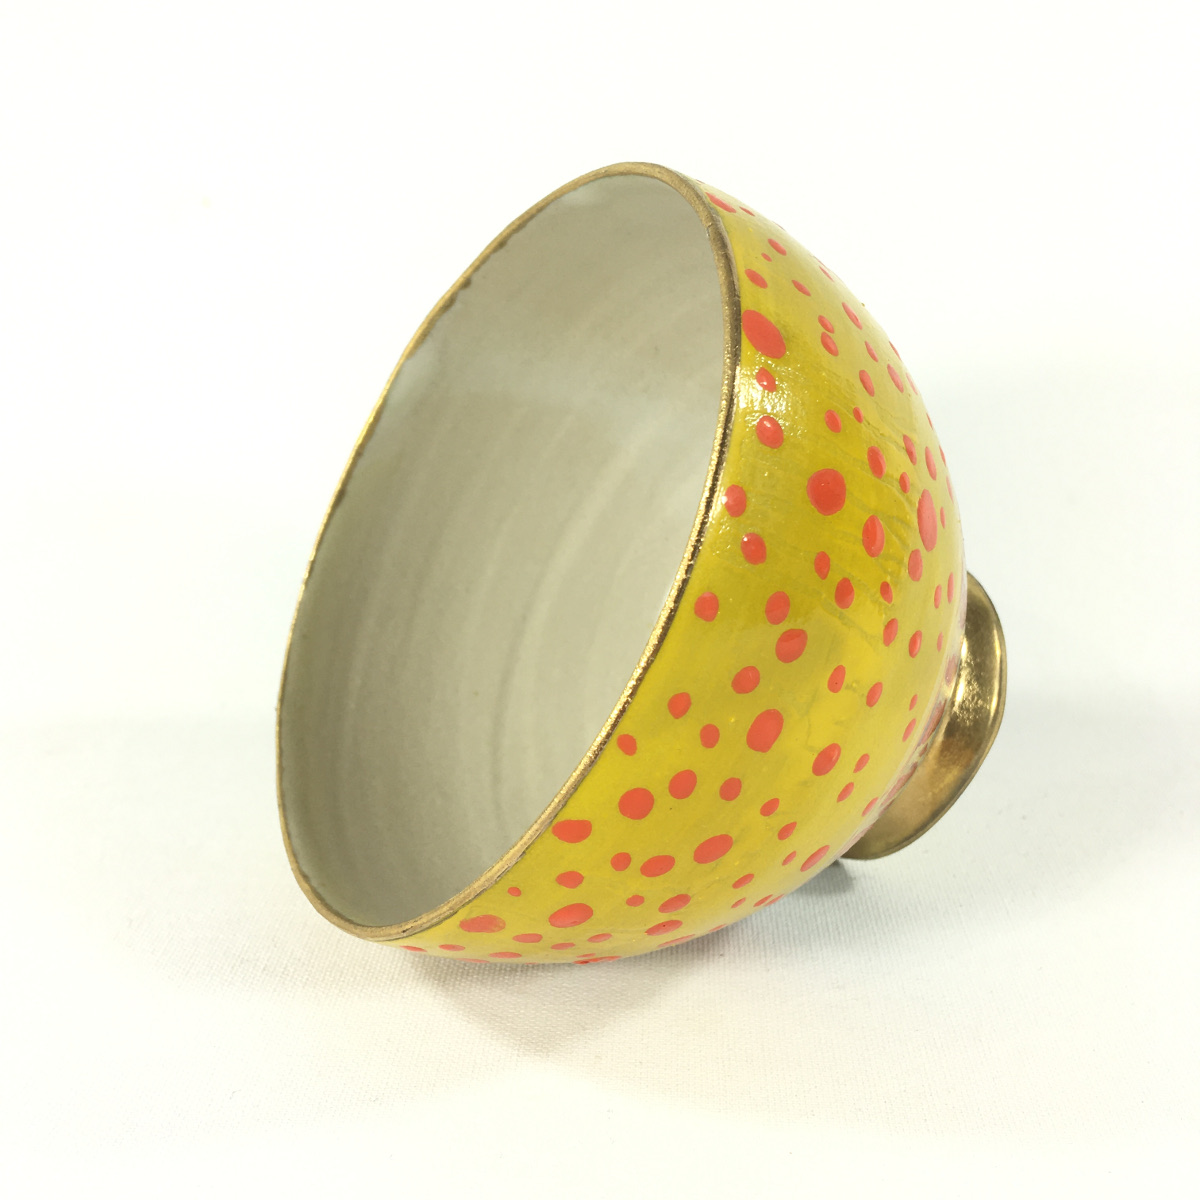 Keramikbowl Punktmuster (gelb) Bild 2